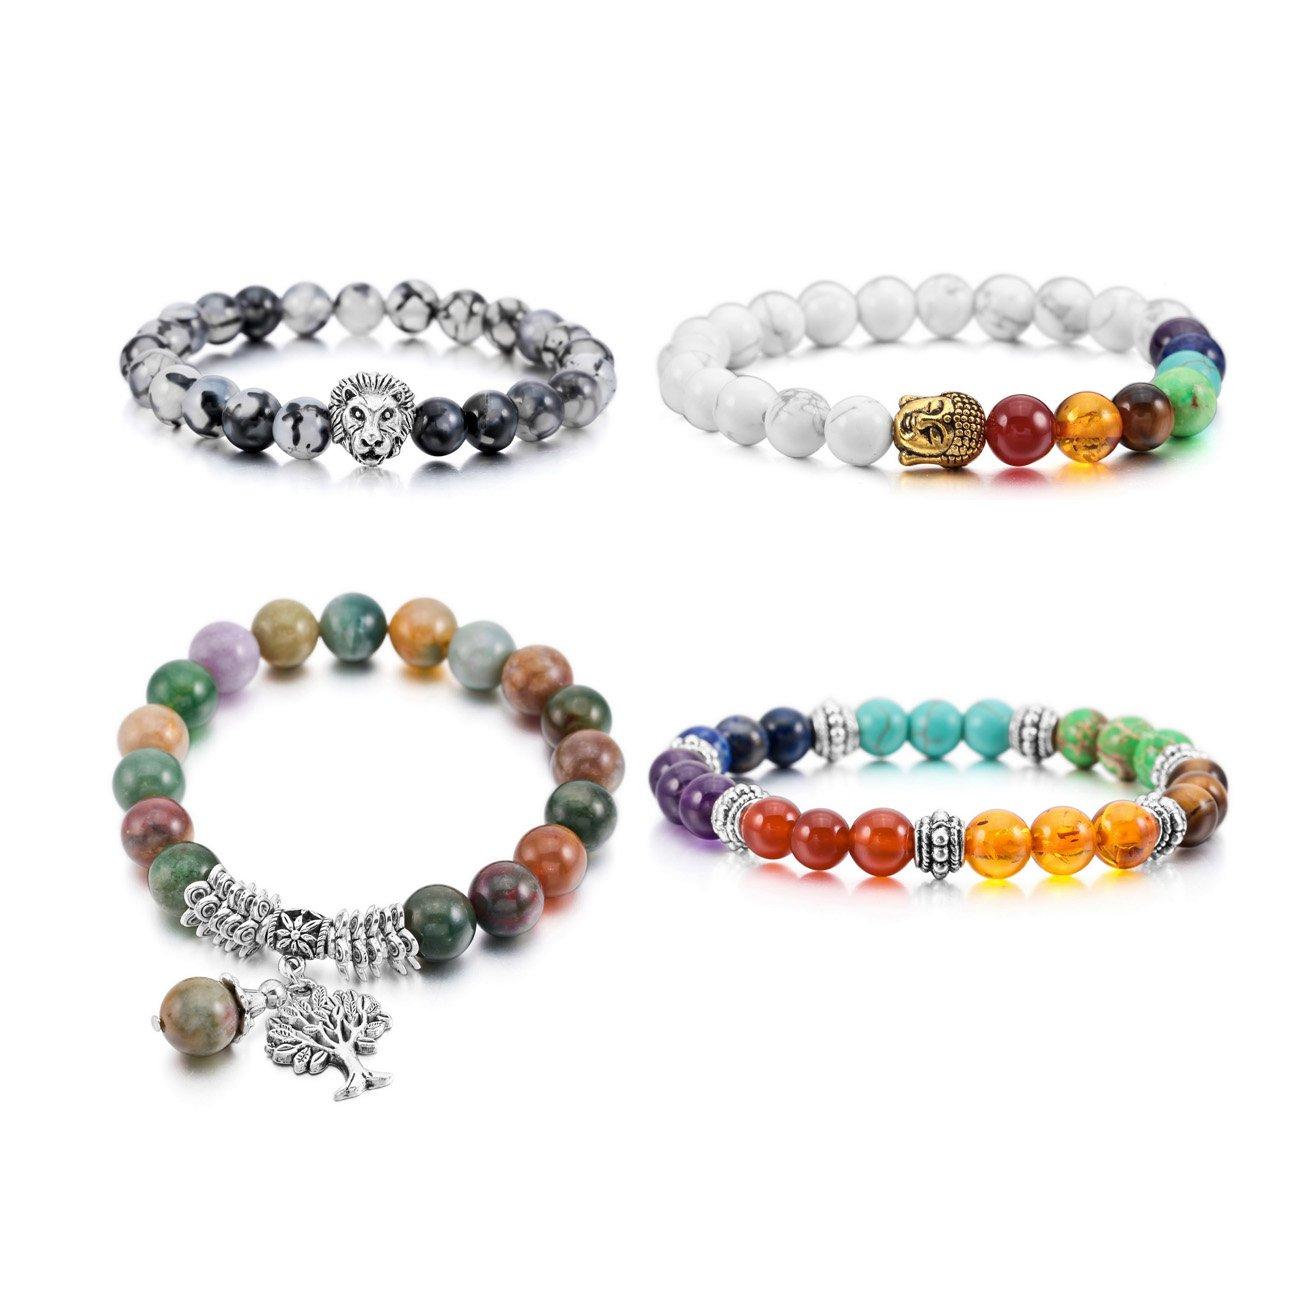 MOWOM 4~6PCS Multicolor Alloy Bracelet Wrist Link Energy Stone Buddha Mala Bead Elastic ca5020310